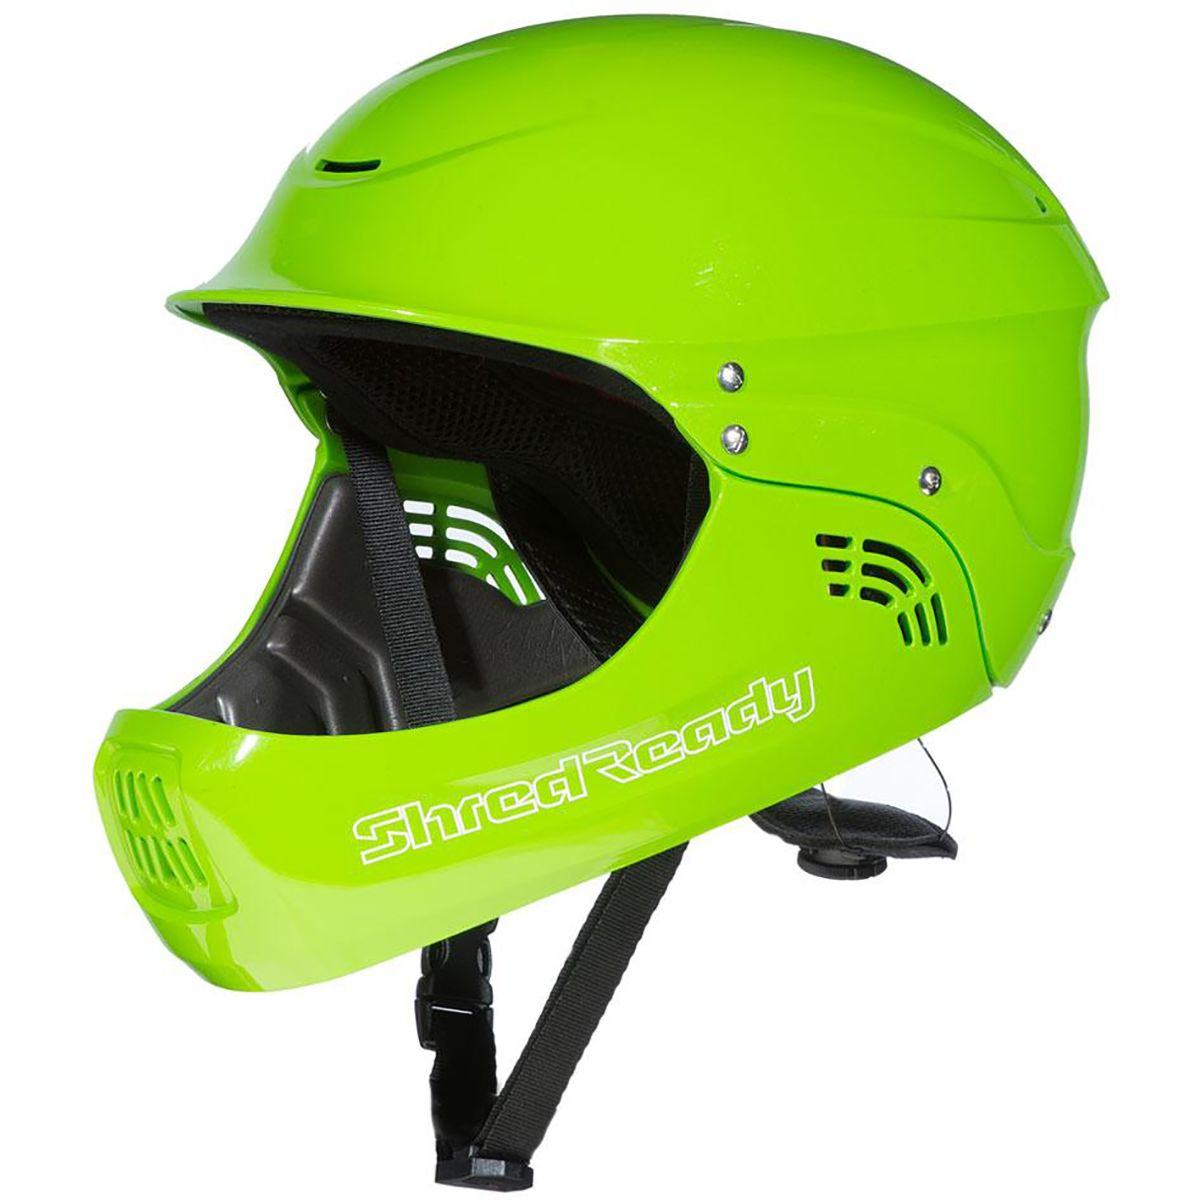 Shred Ready Standard Full-Face Kayak Helmet Flash Green, One Size